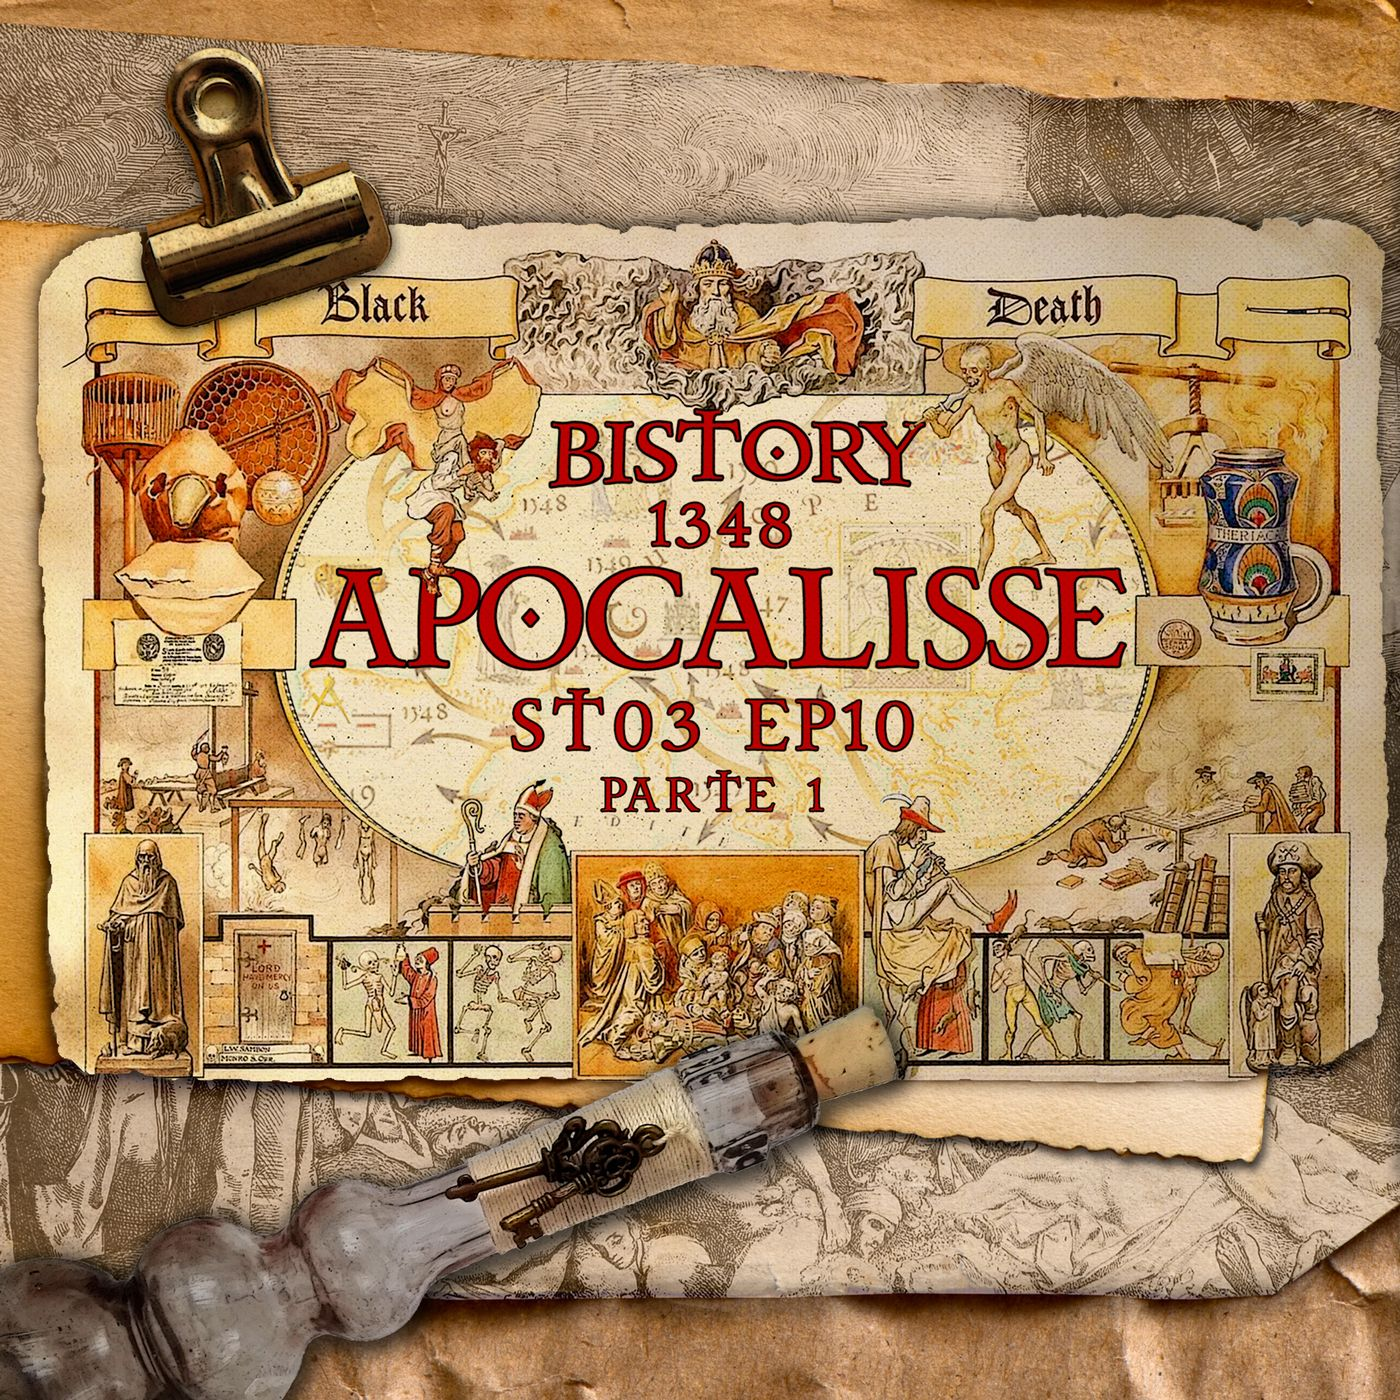 Bistory S03E10 - 1348 Apocalisse